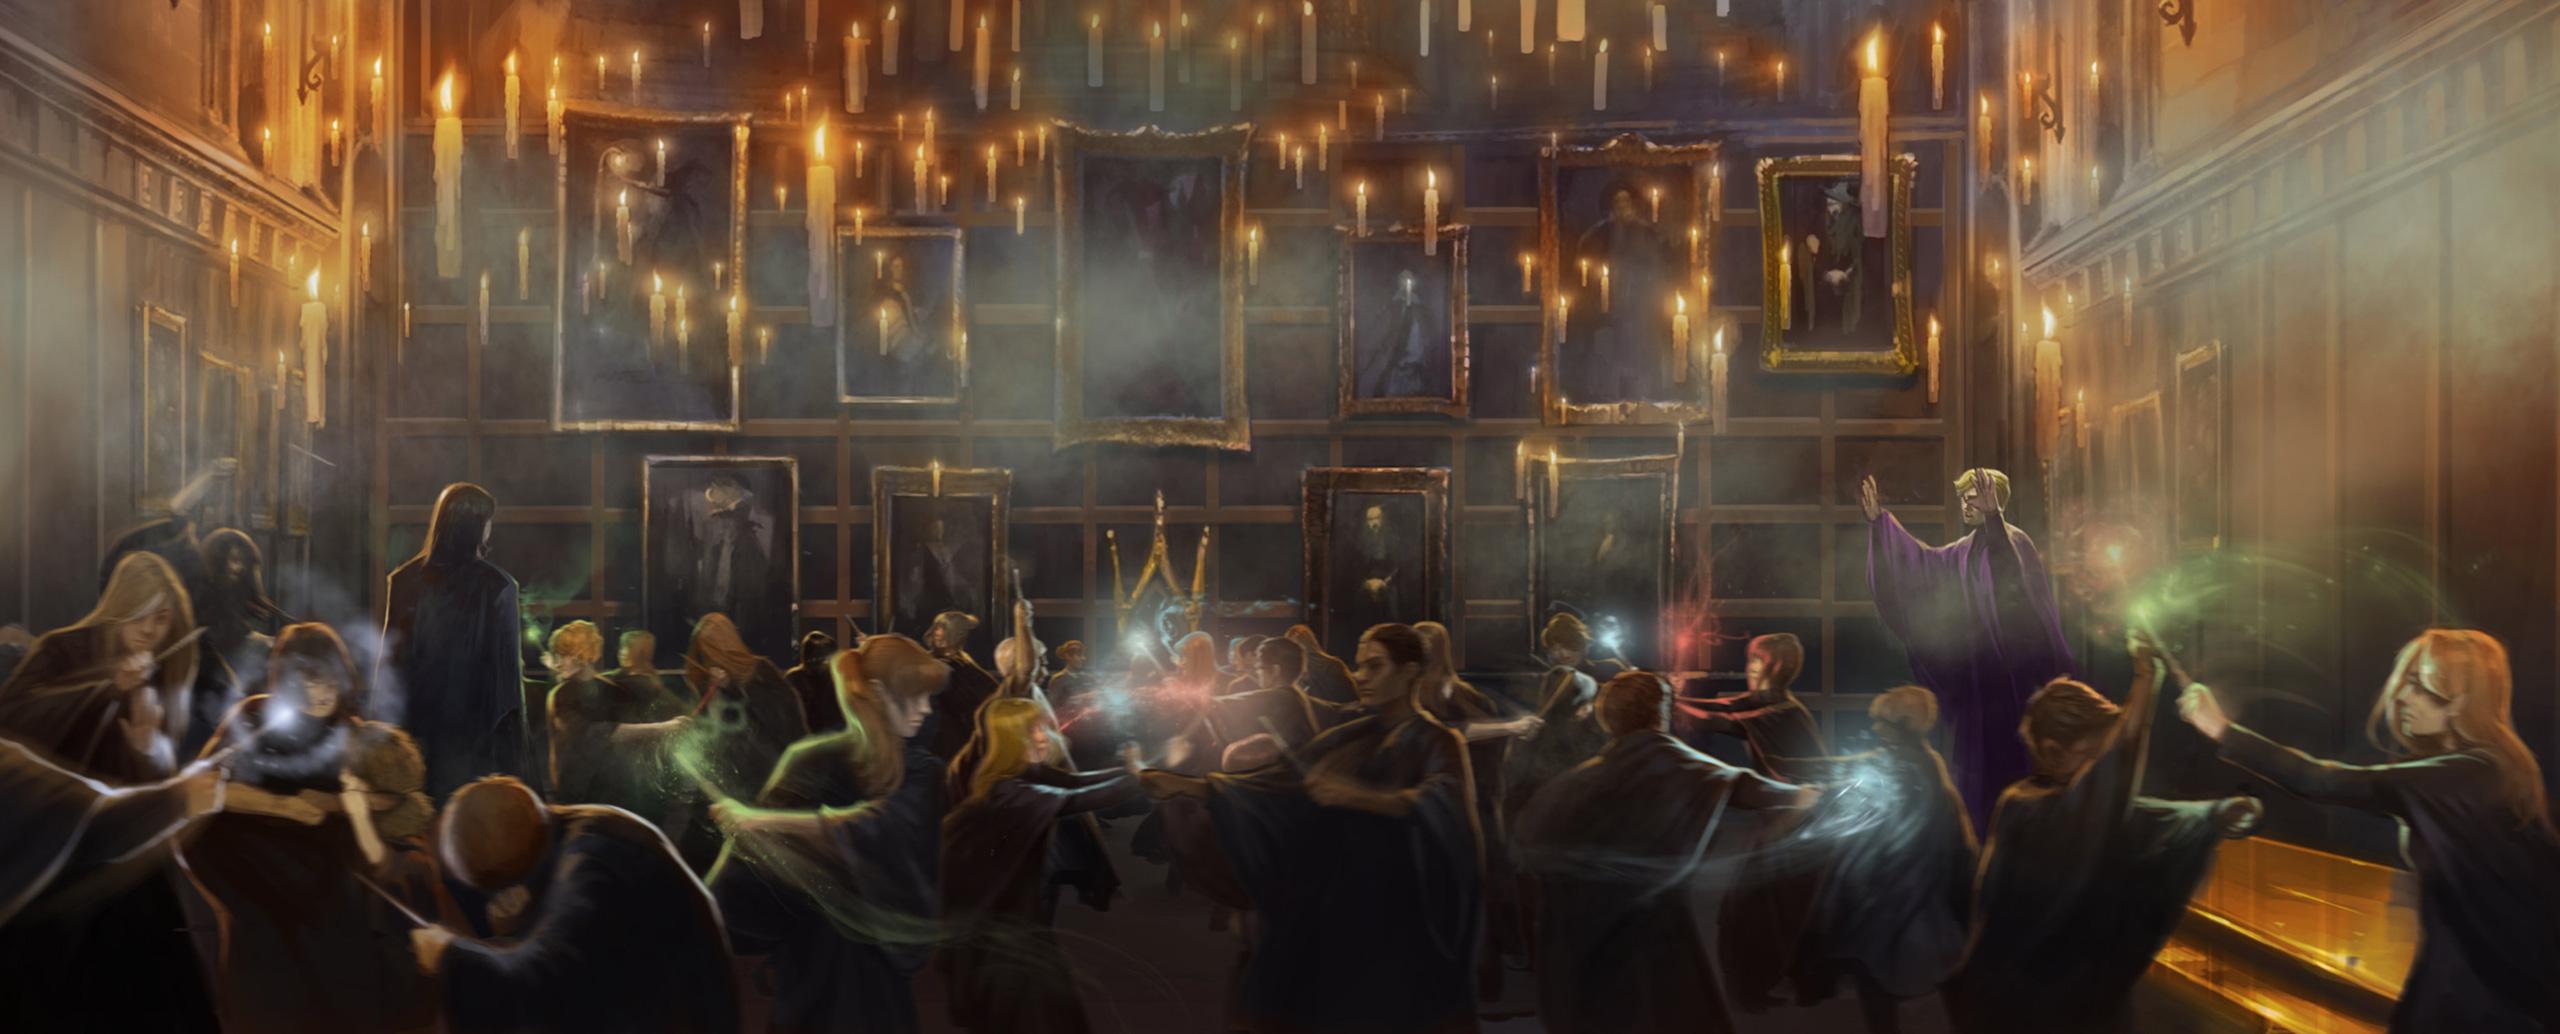 Hogwarts Mystery duelling club background image